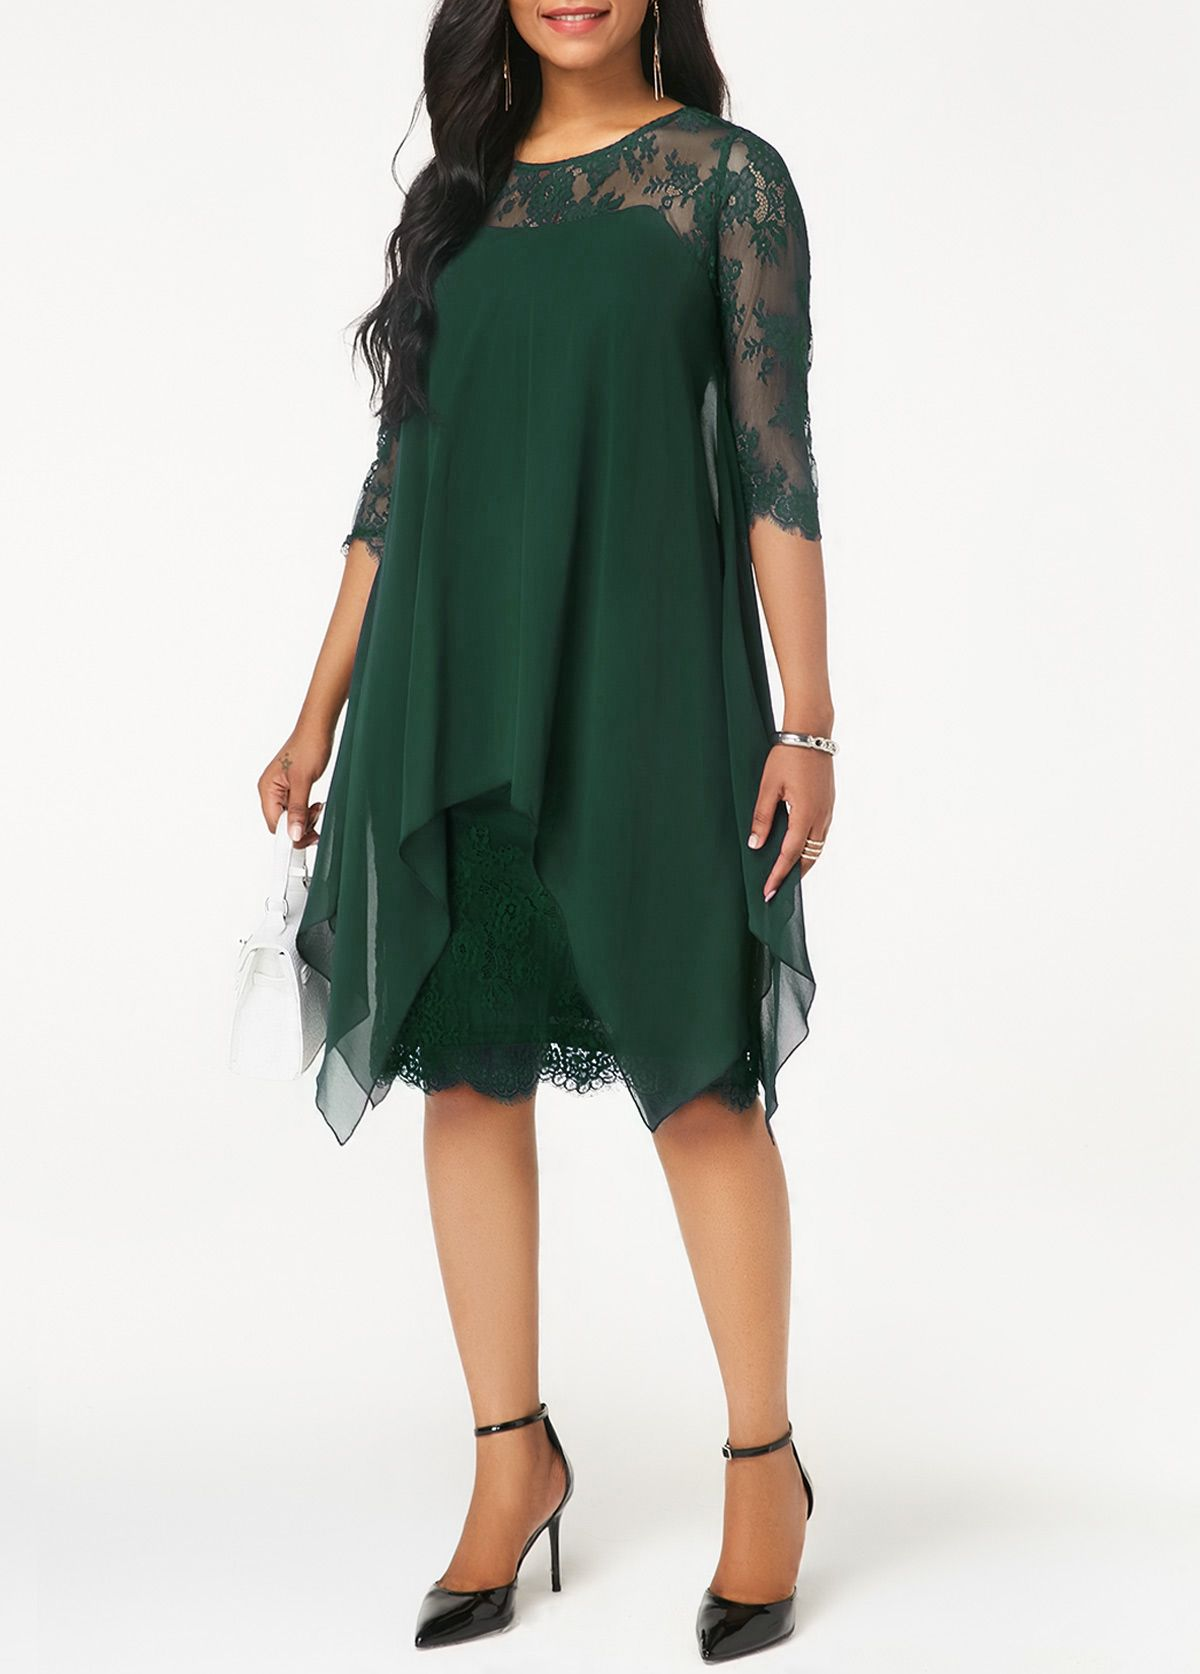 59166f3b82 Dark Green Three Quarter Sleeve Chiffon Overlay Lace Dress